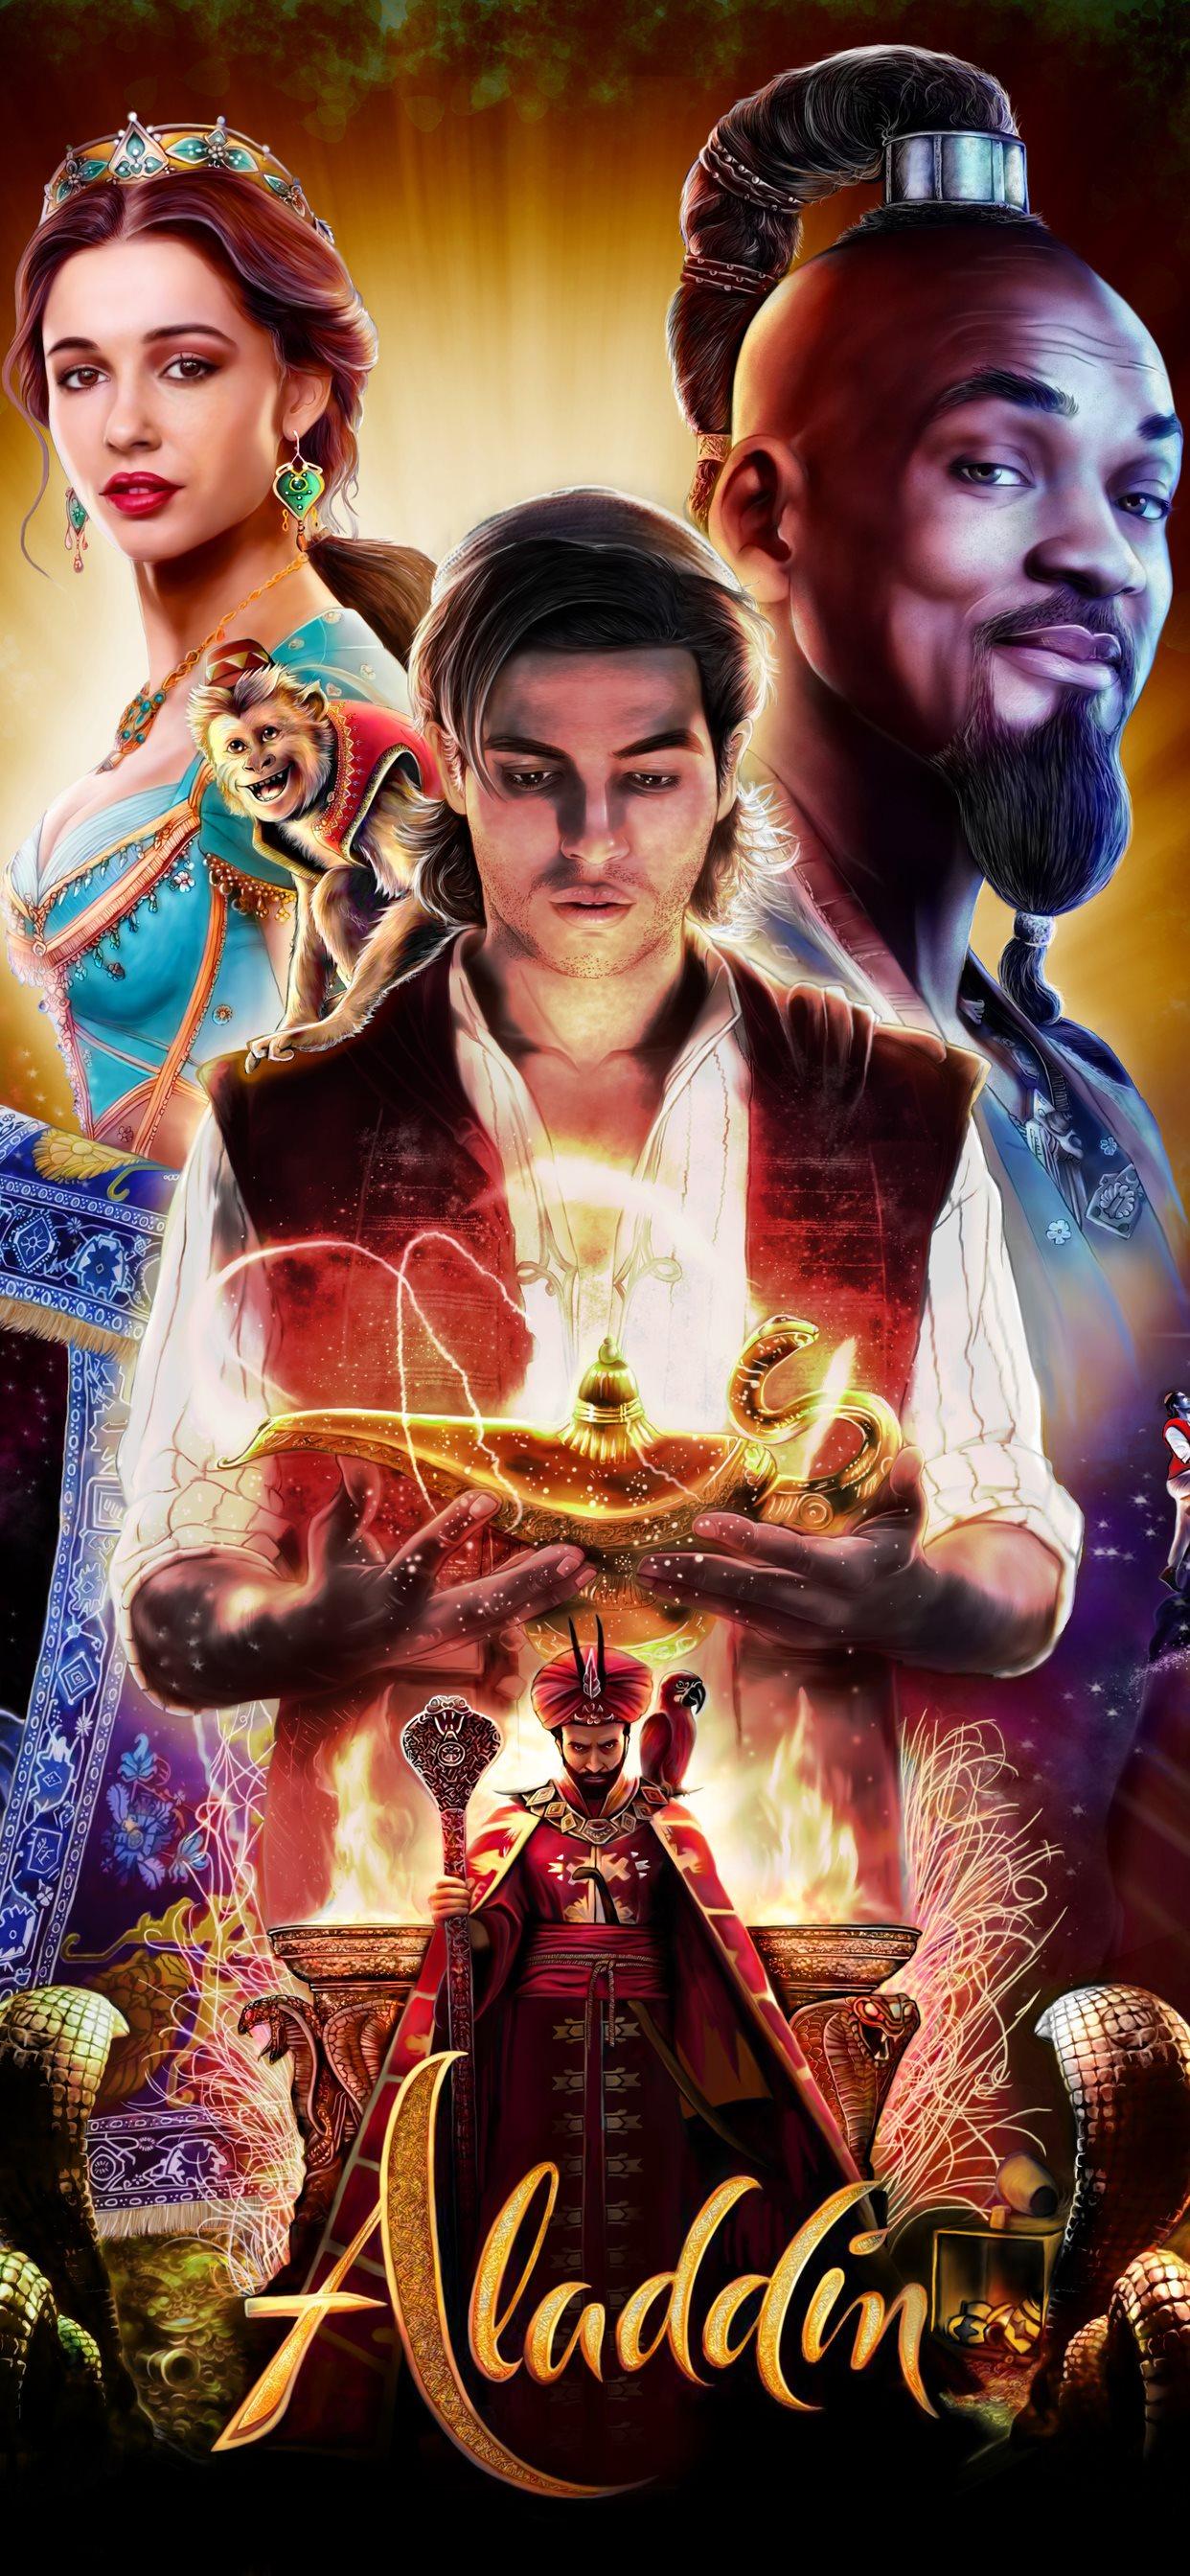 Aladdin Movie Poster 4k - HD Wallpaper